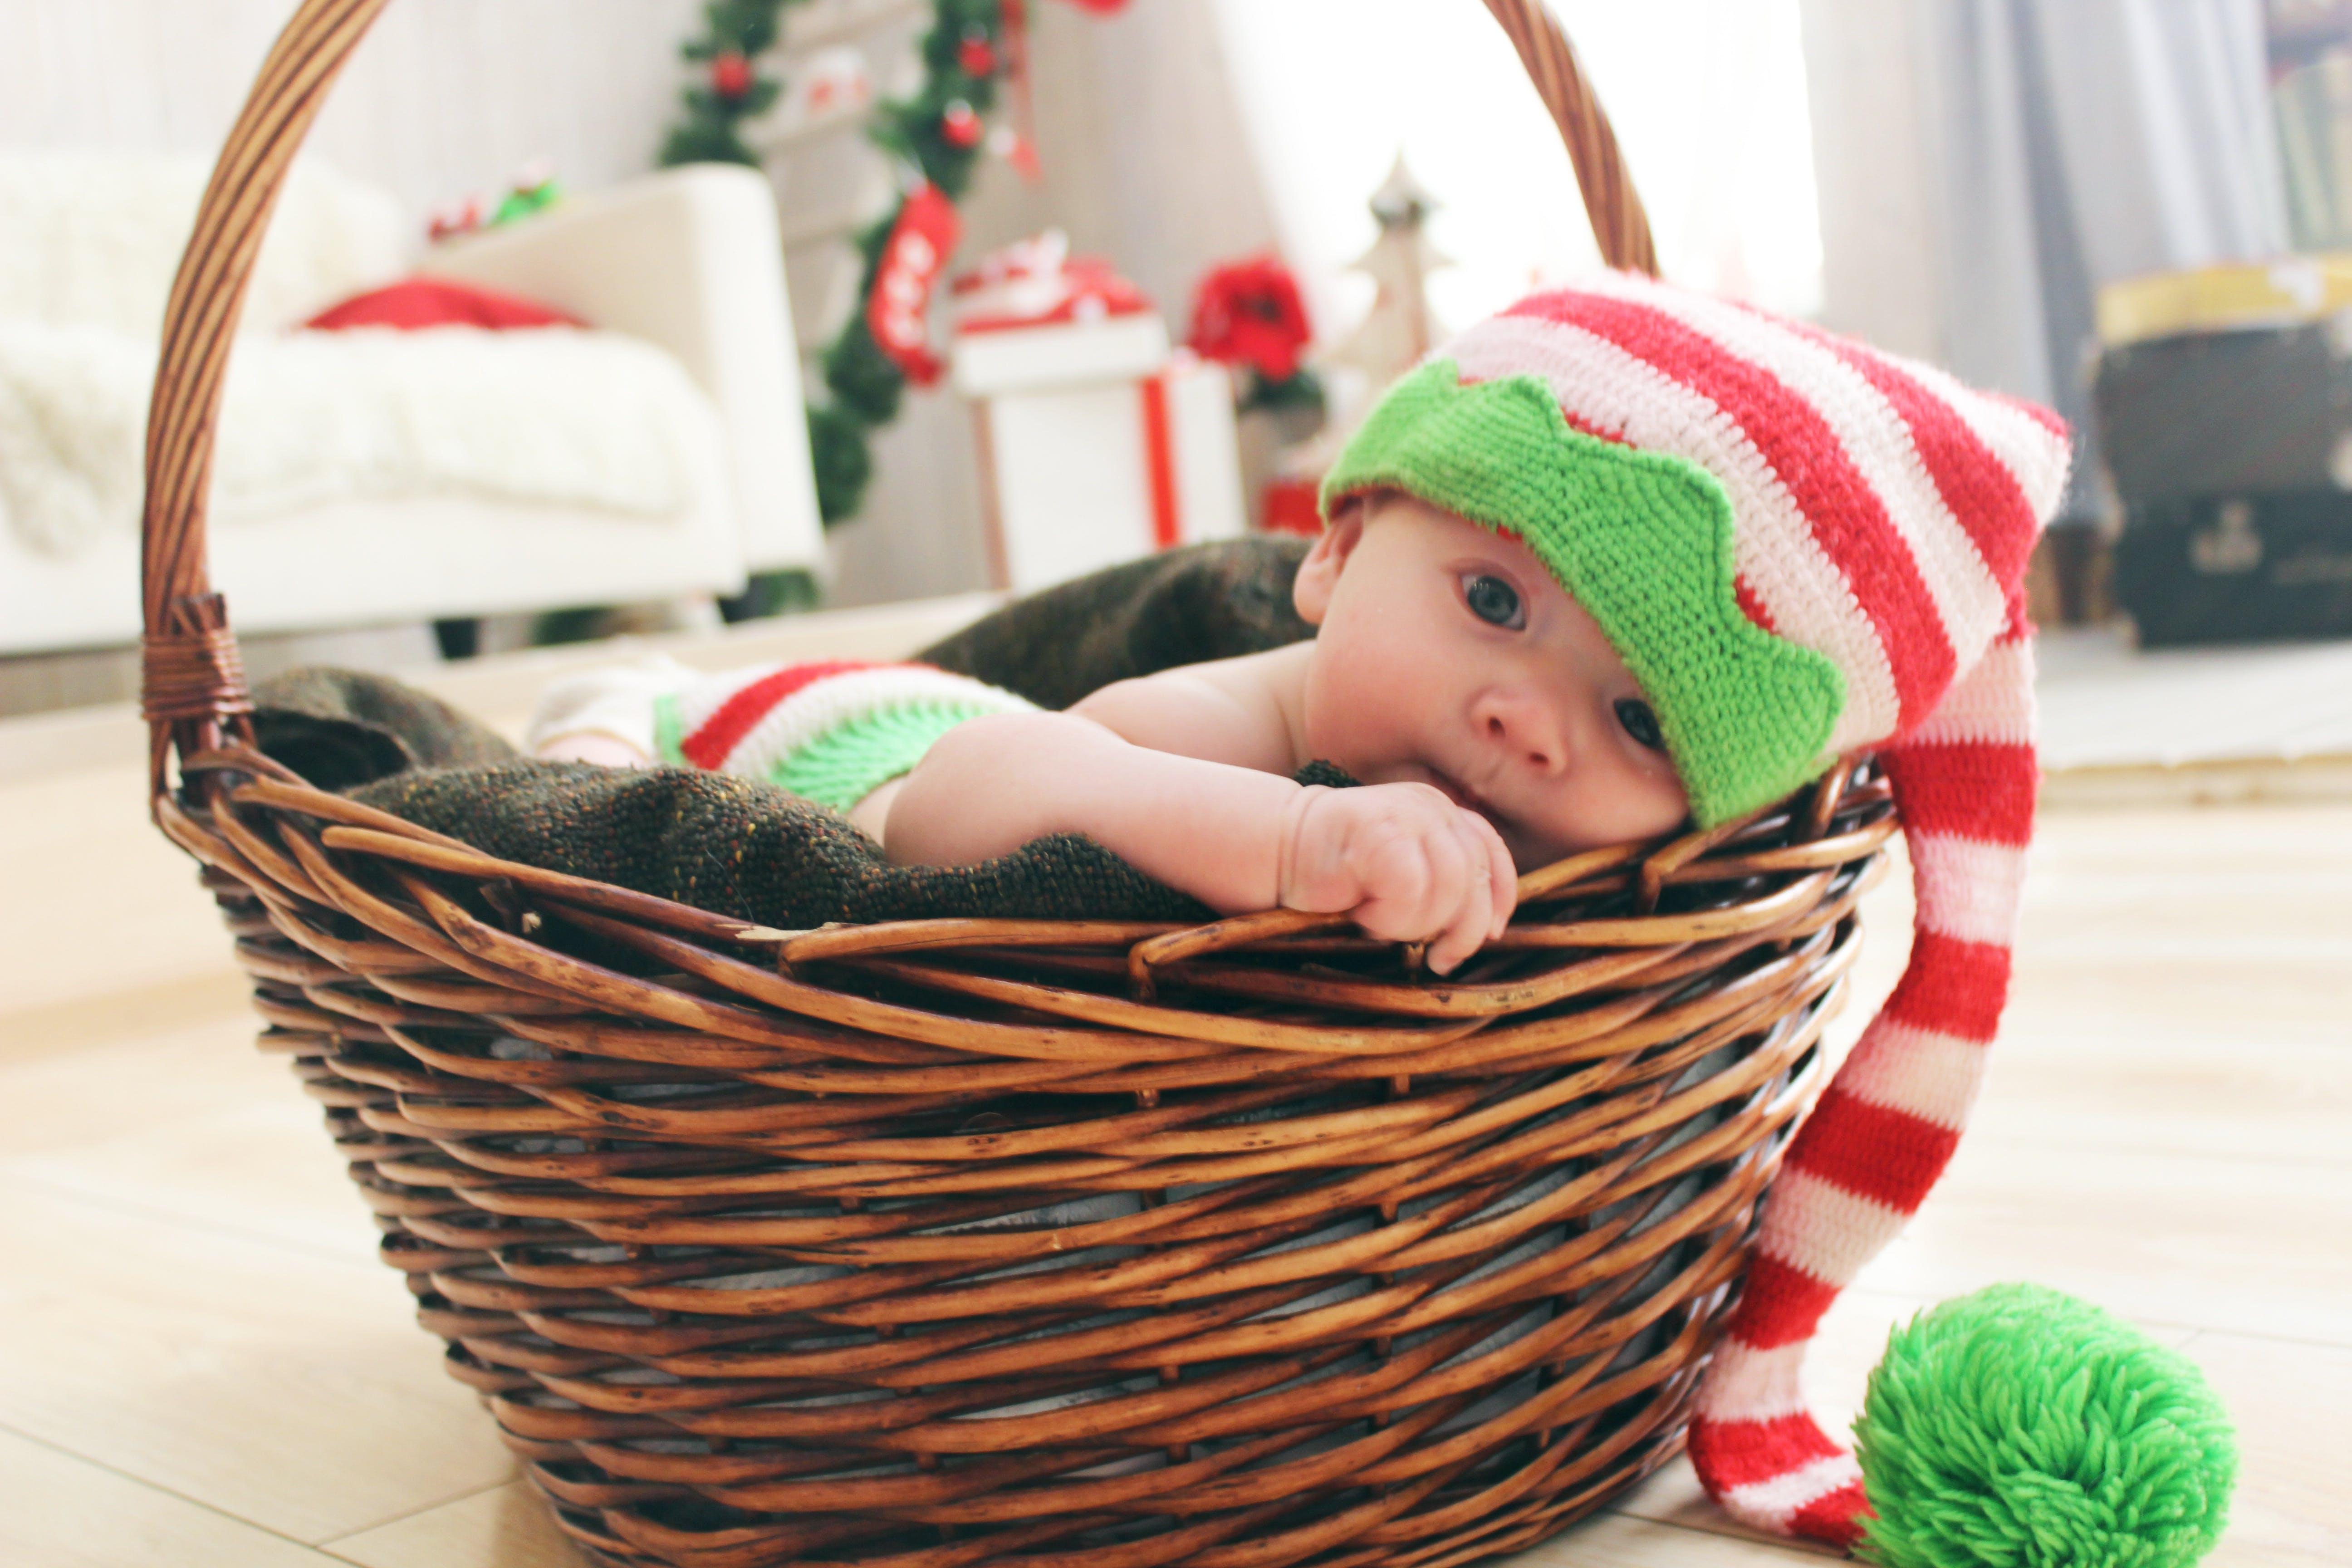 adorable, baby, basket